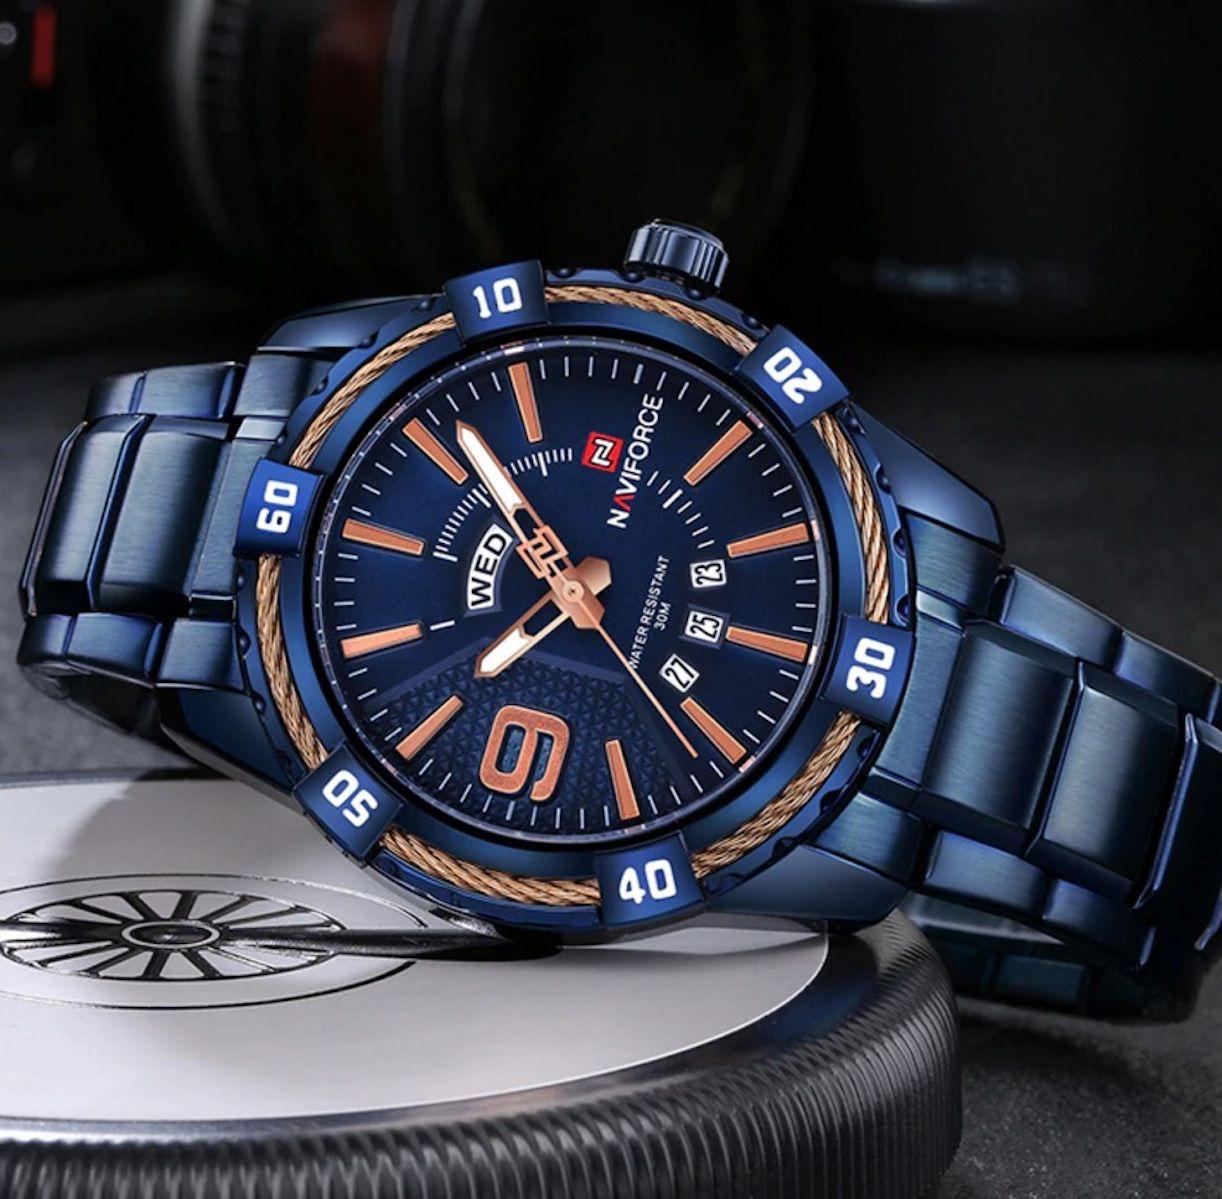 Relógio Masculino Luxo Naviforce Original Azul Preto Dourado